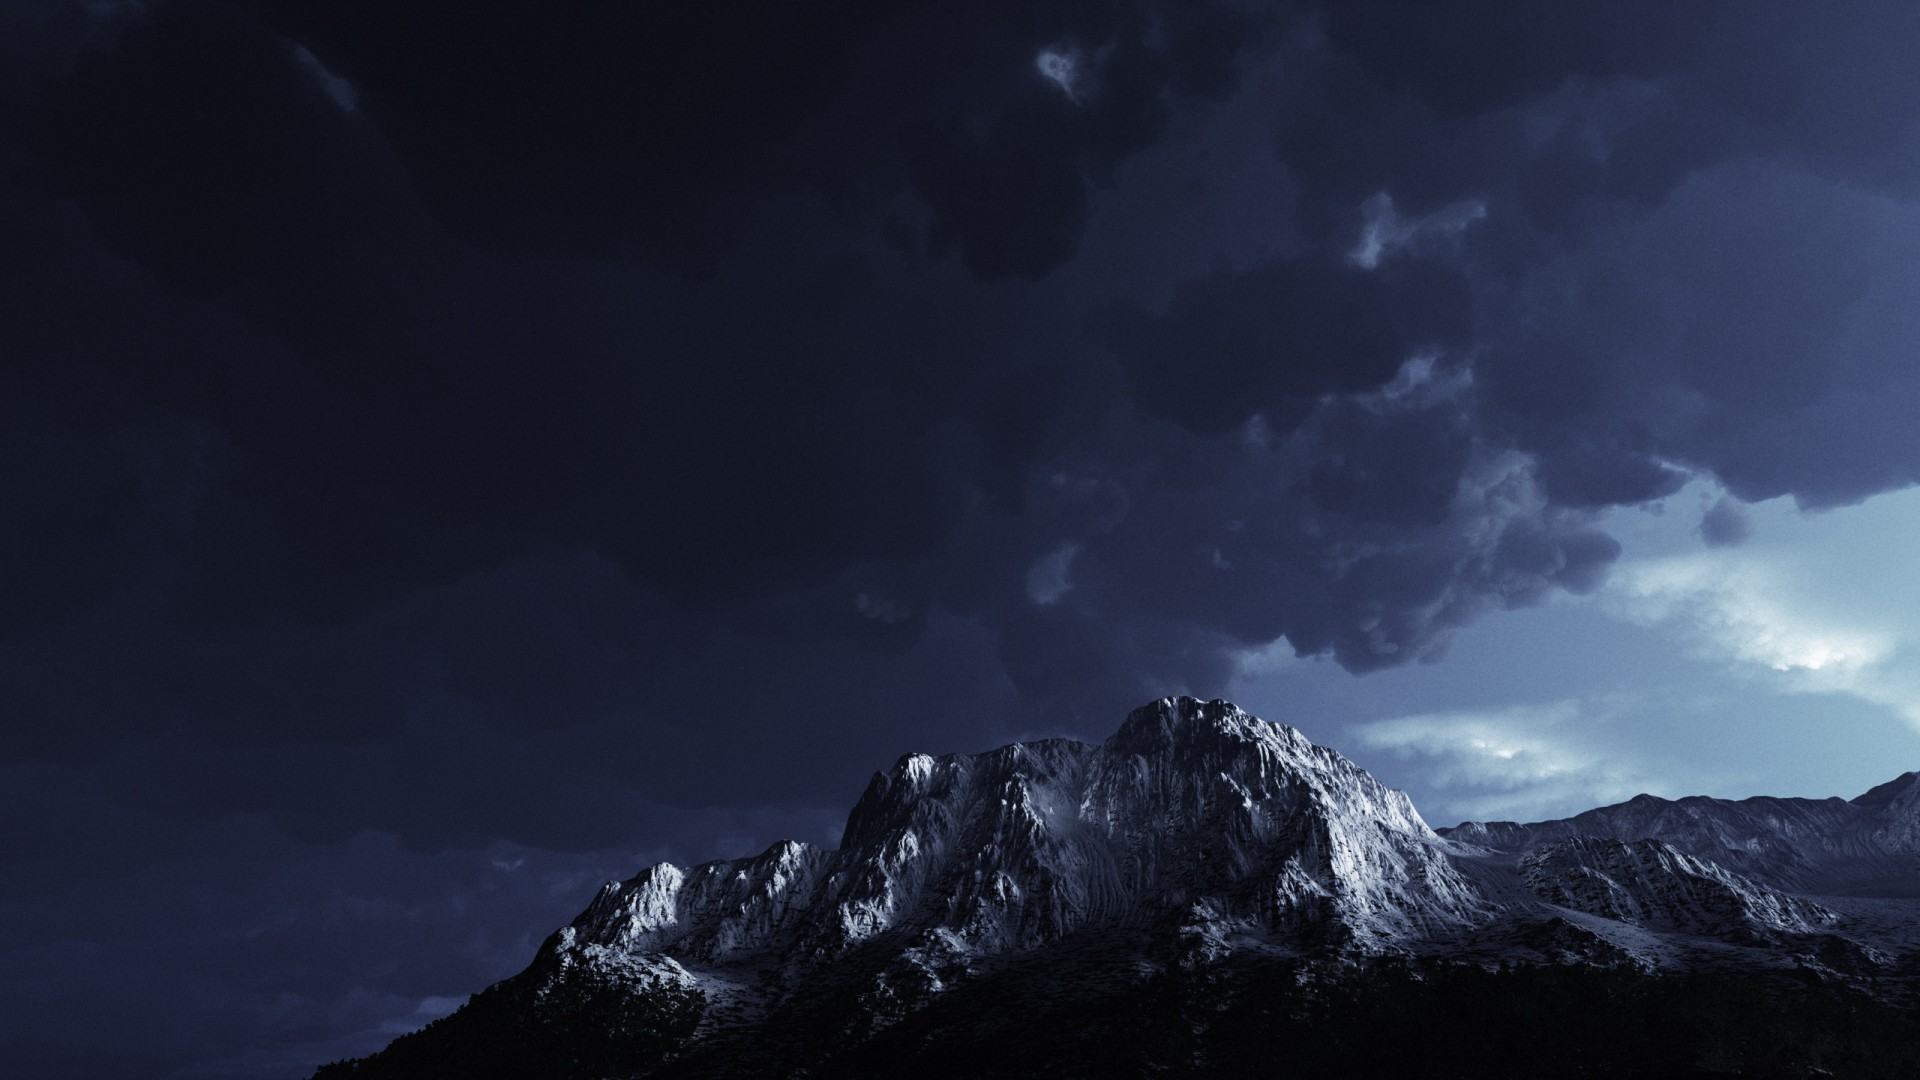 Dark Storm Mountain Hd Desktop Wallpaper Images Picture 1920x1080